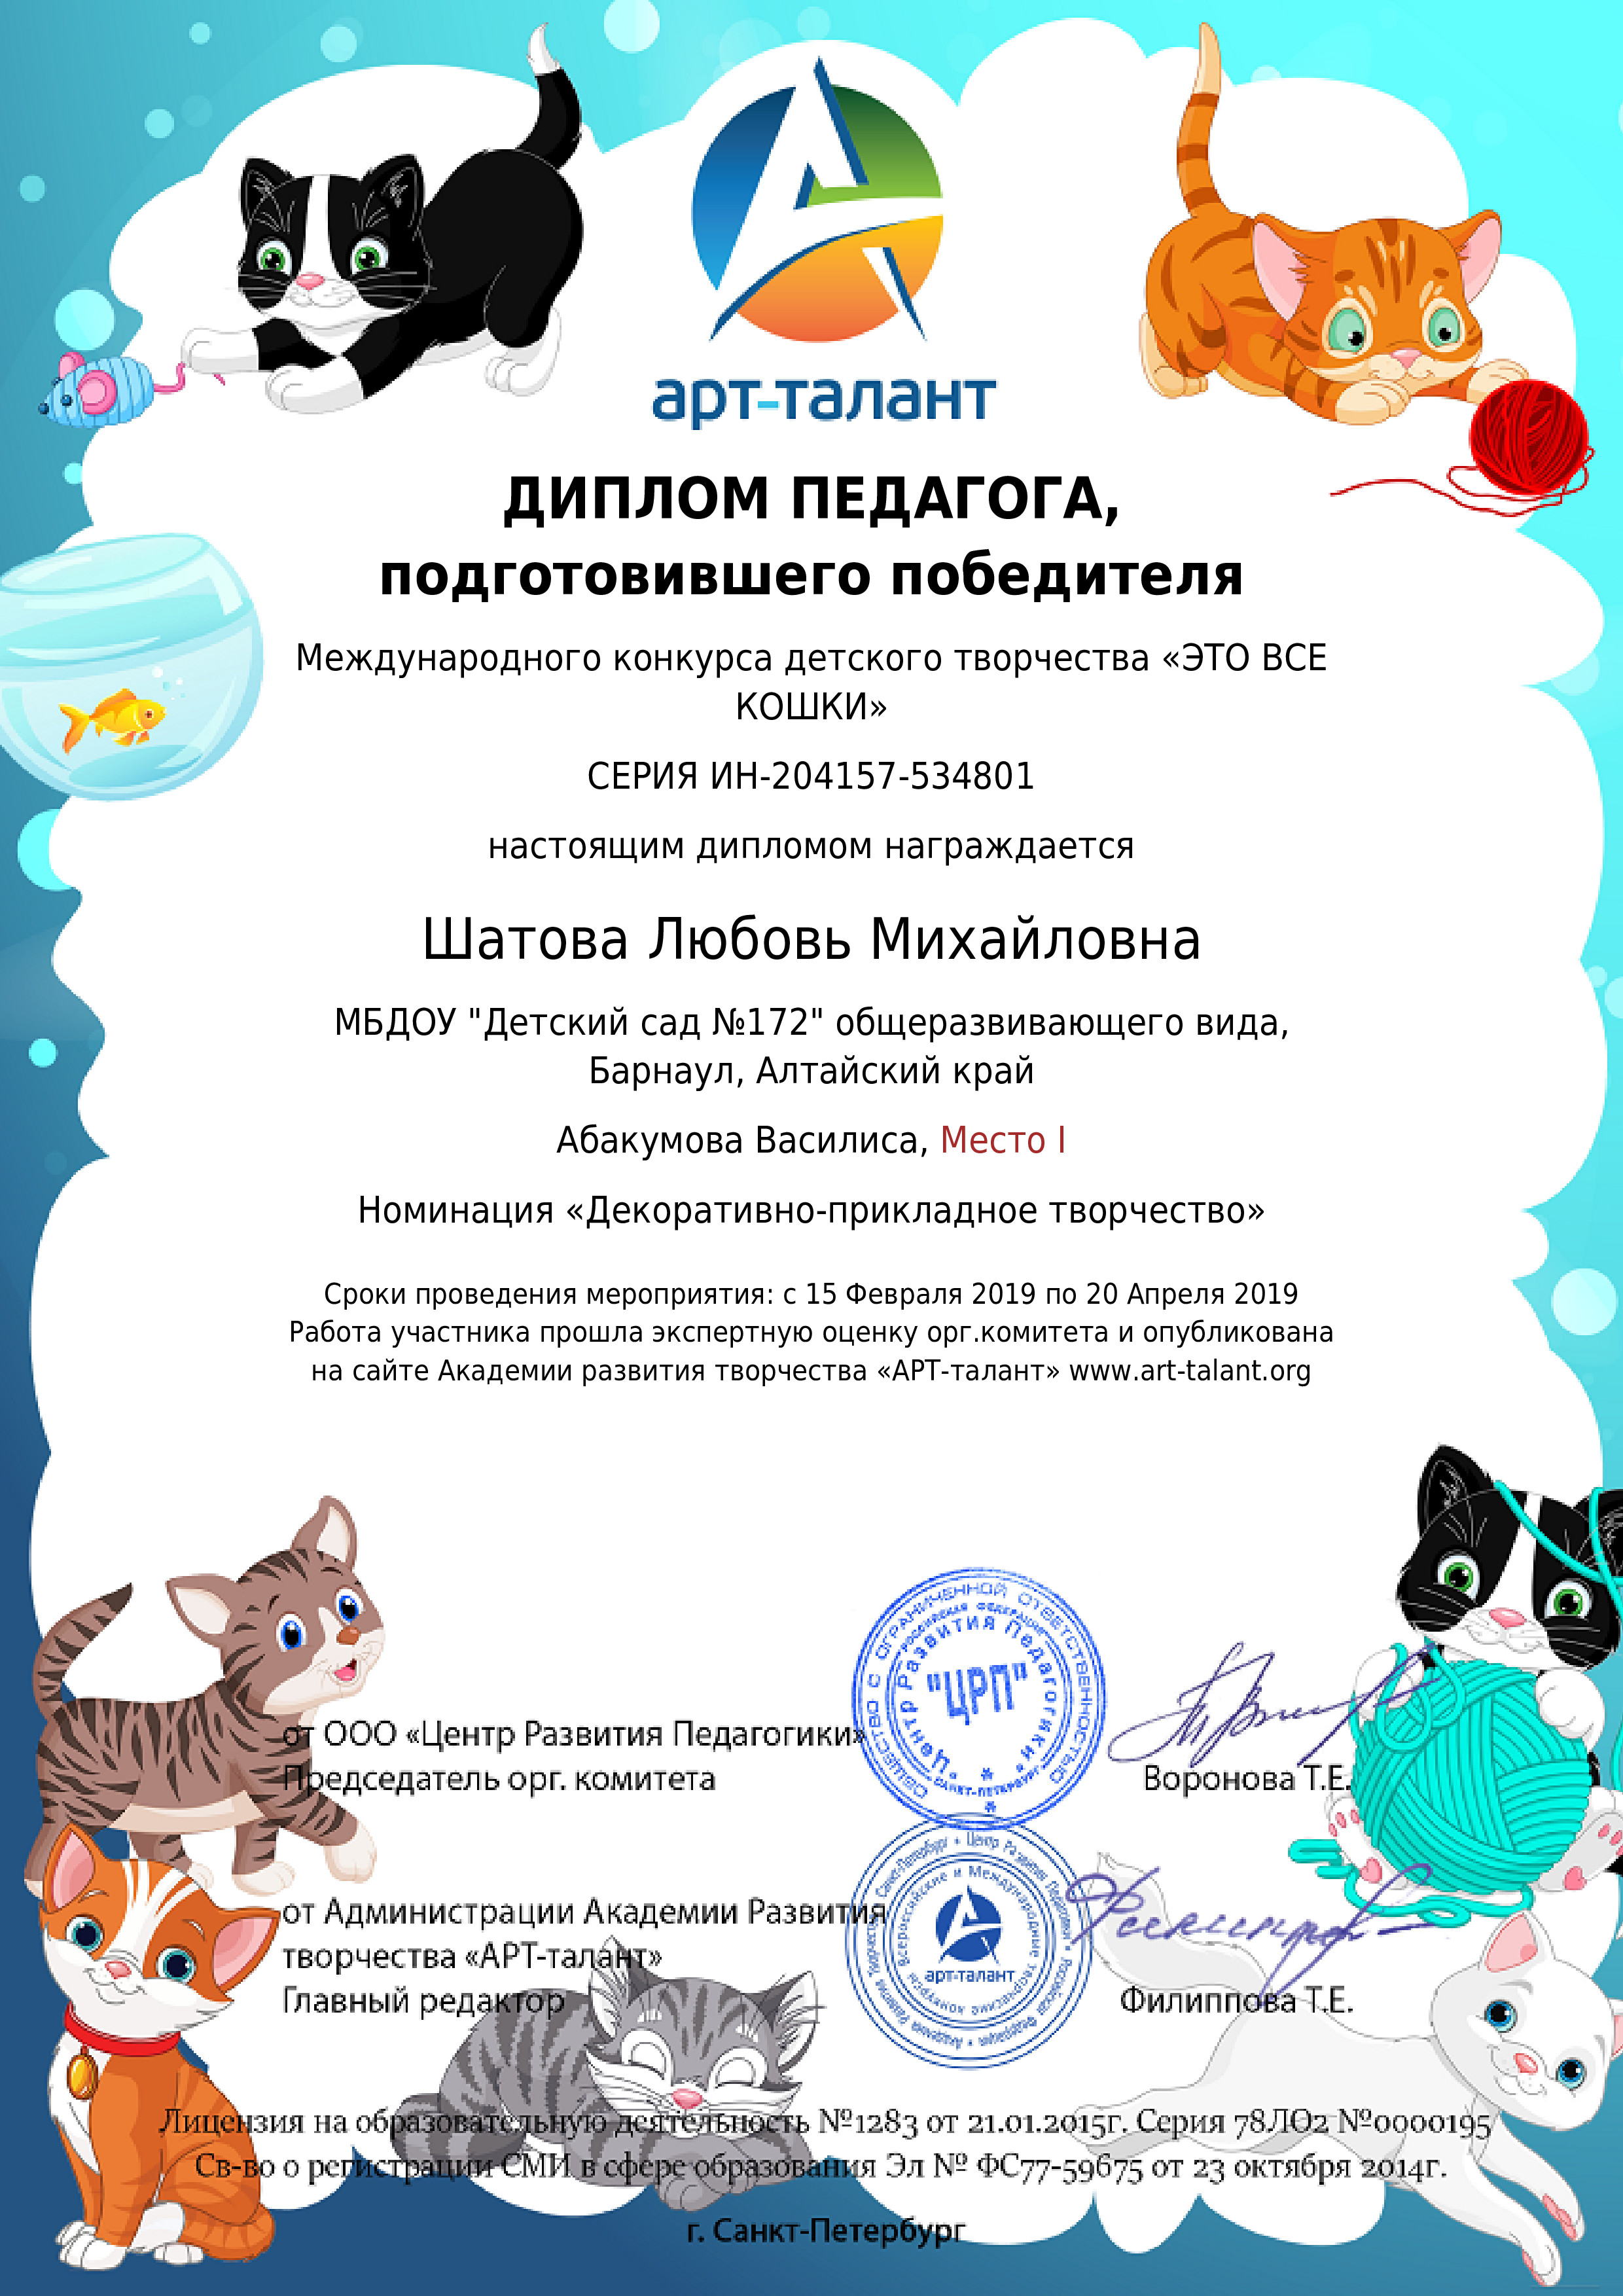 Шатова-Любовь-Михайловна